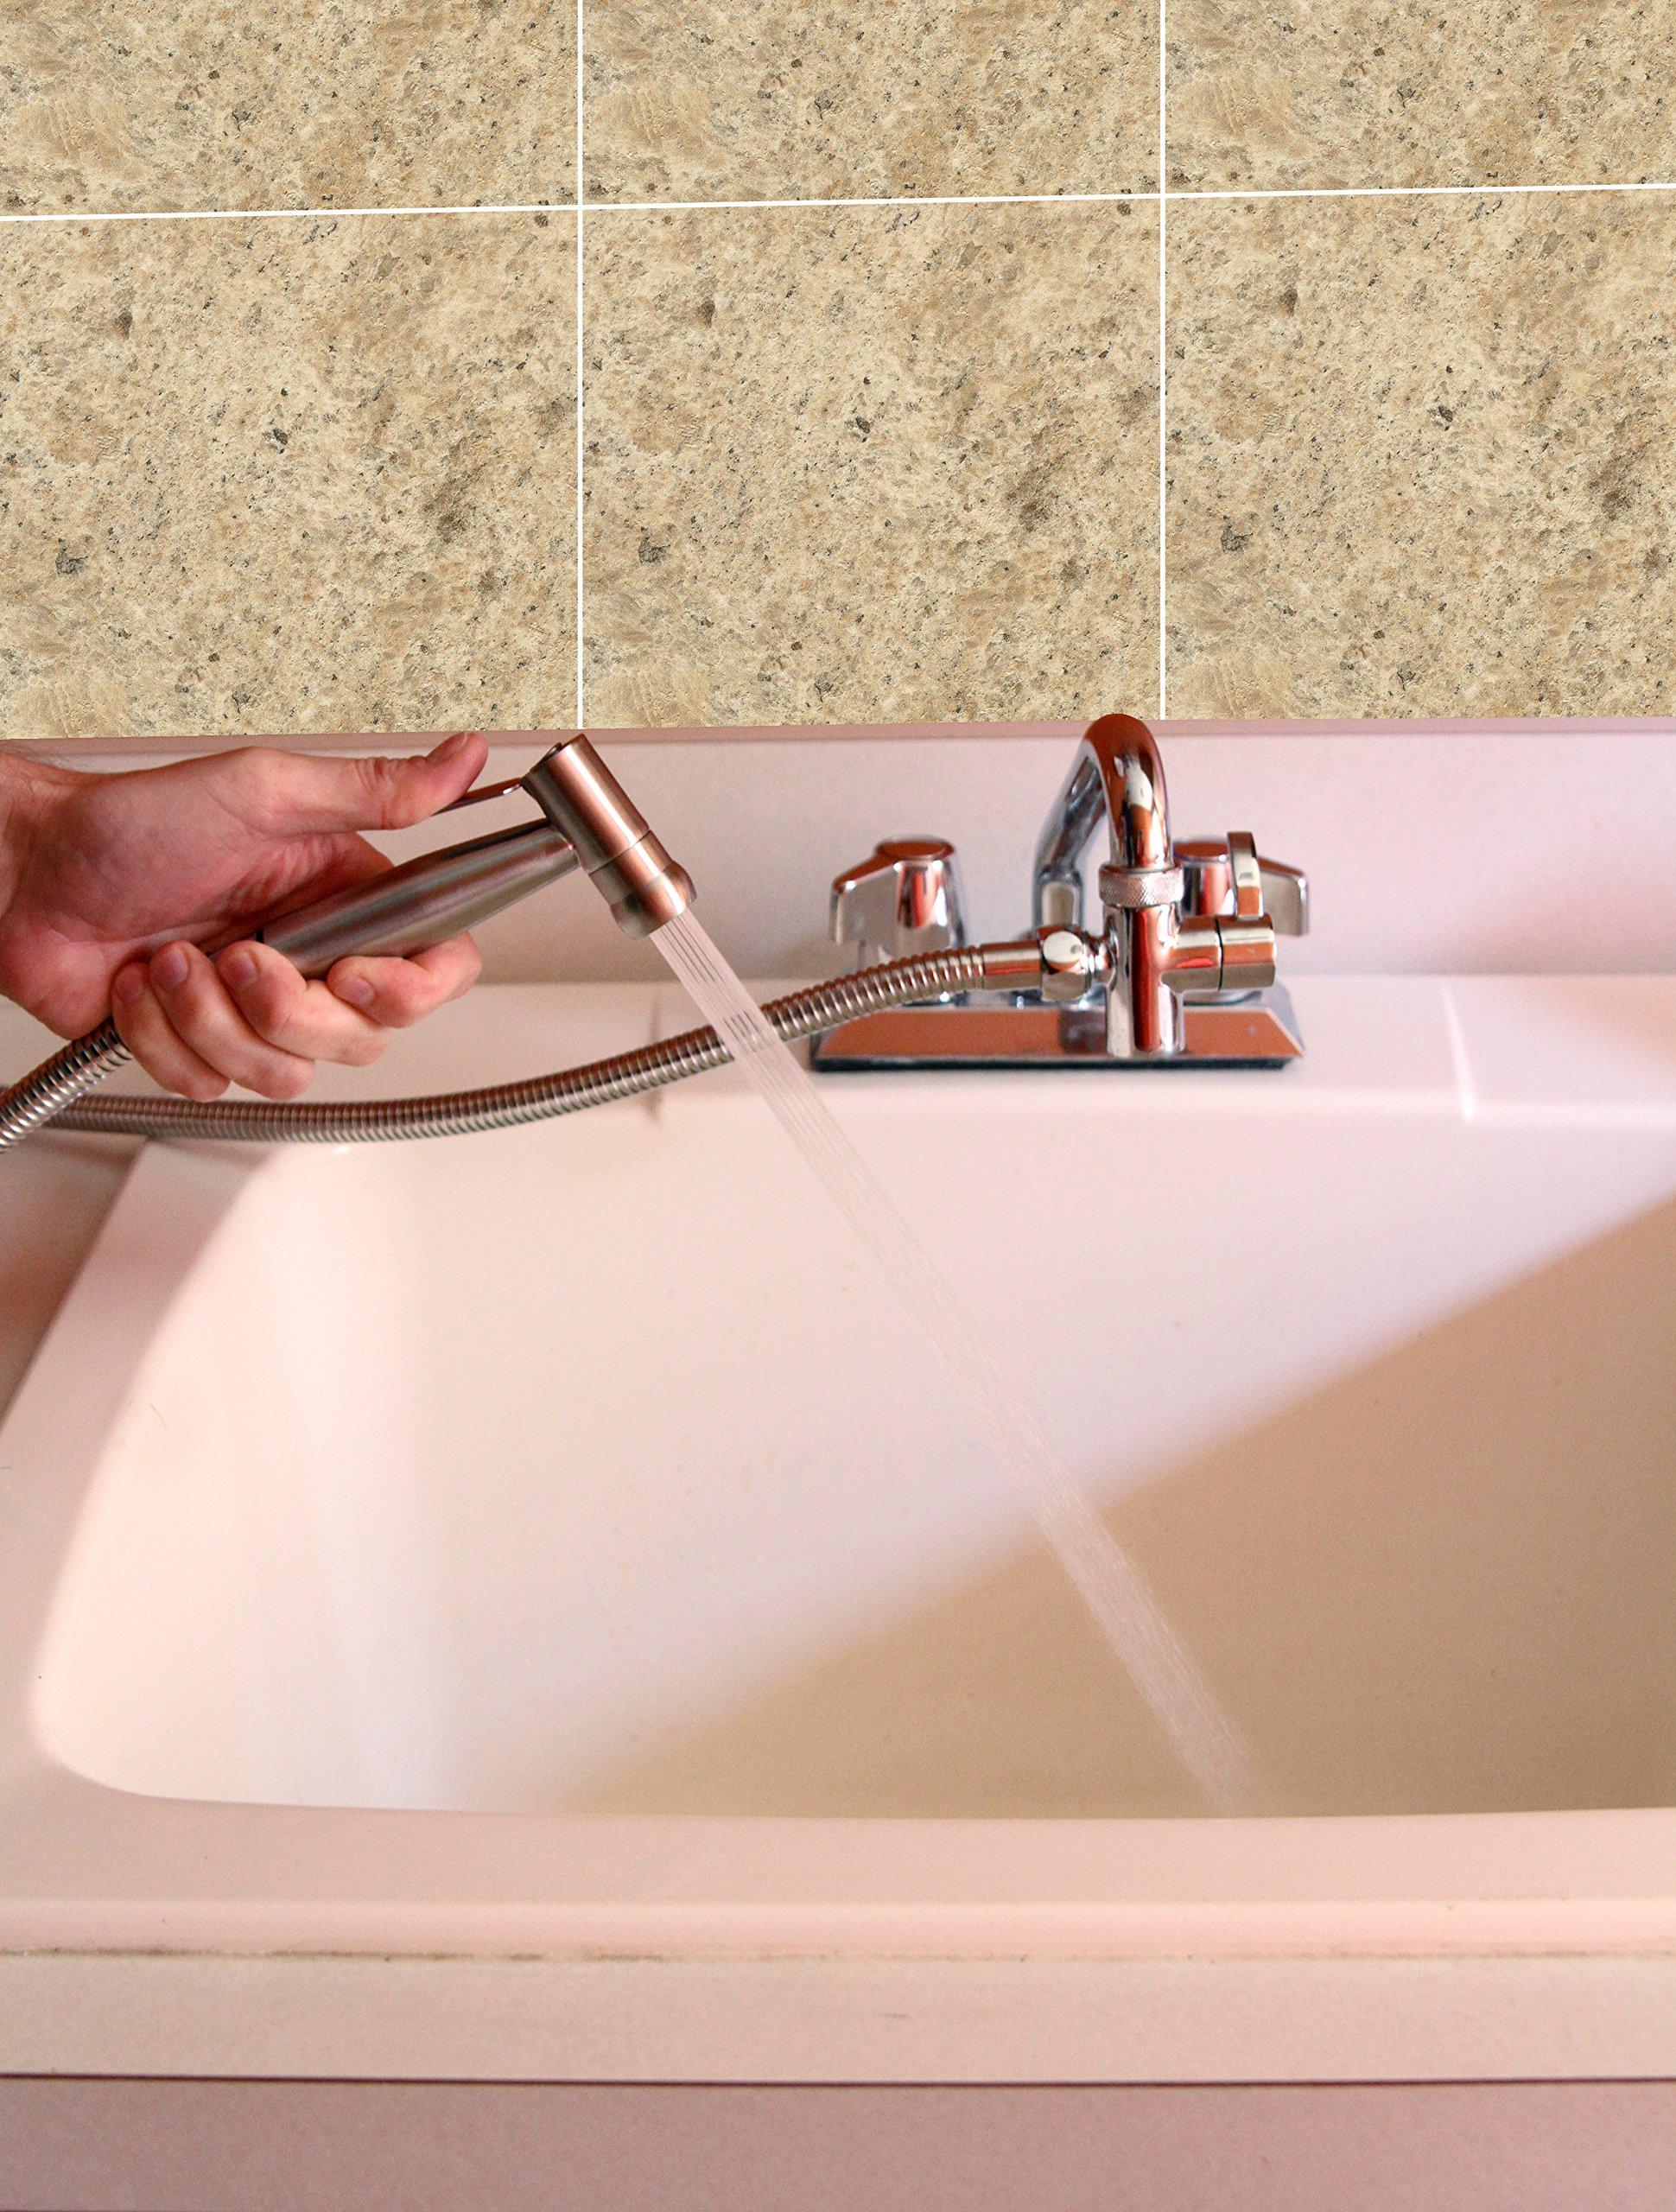 Smarterfresh Faucet Sprayer Warm Water Bidet Hot And Cold Bidet